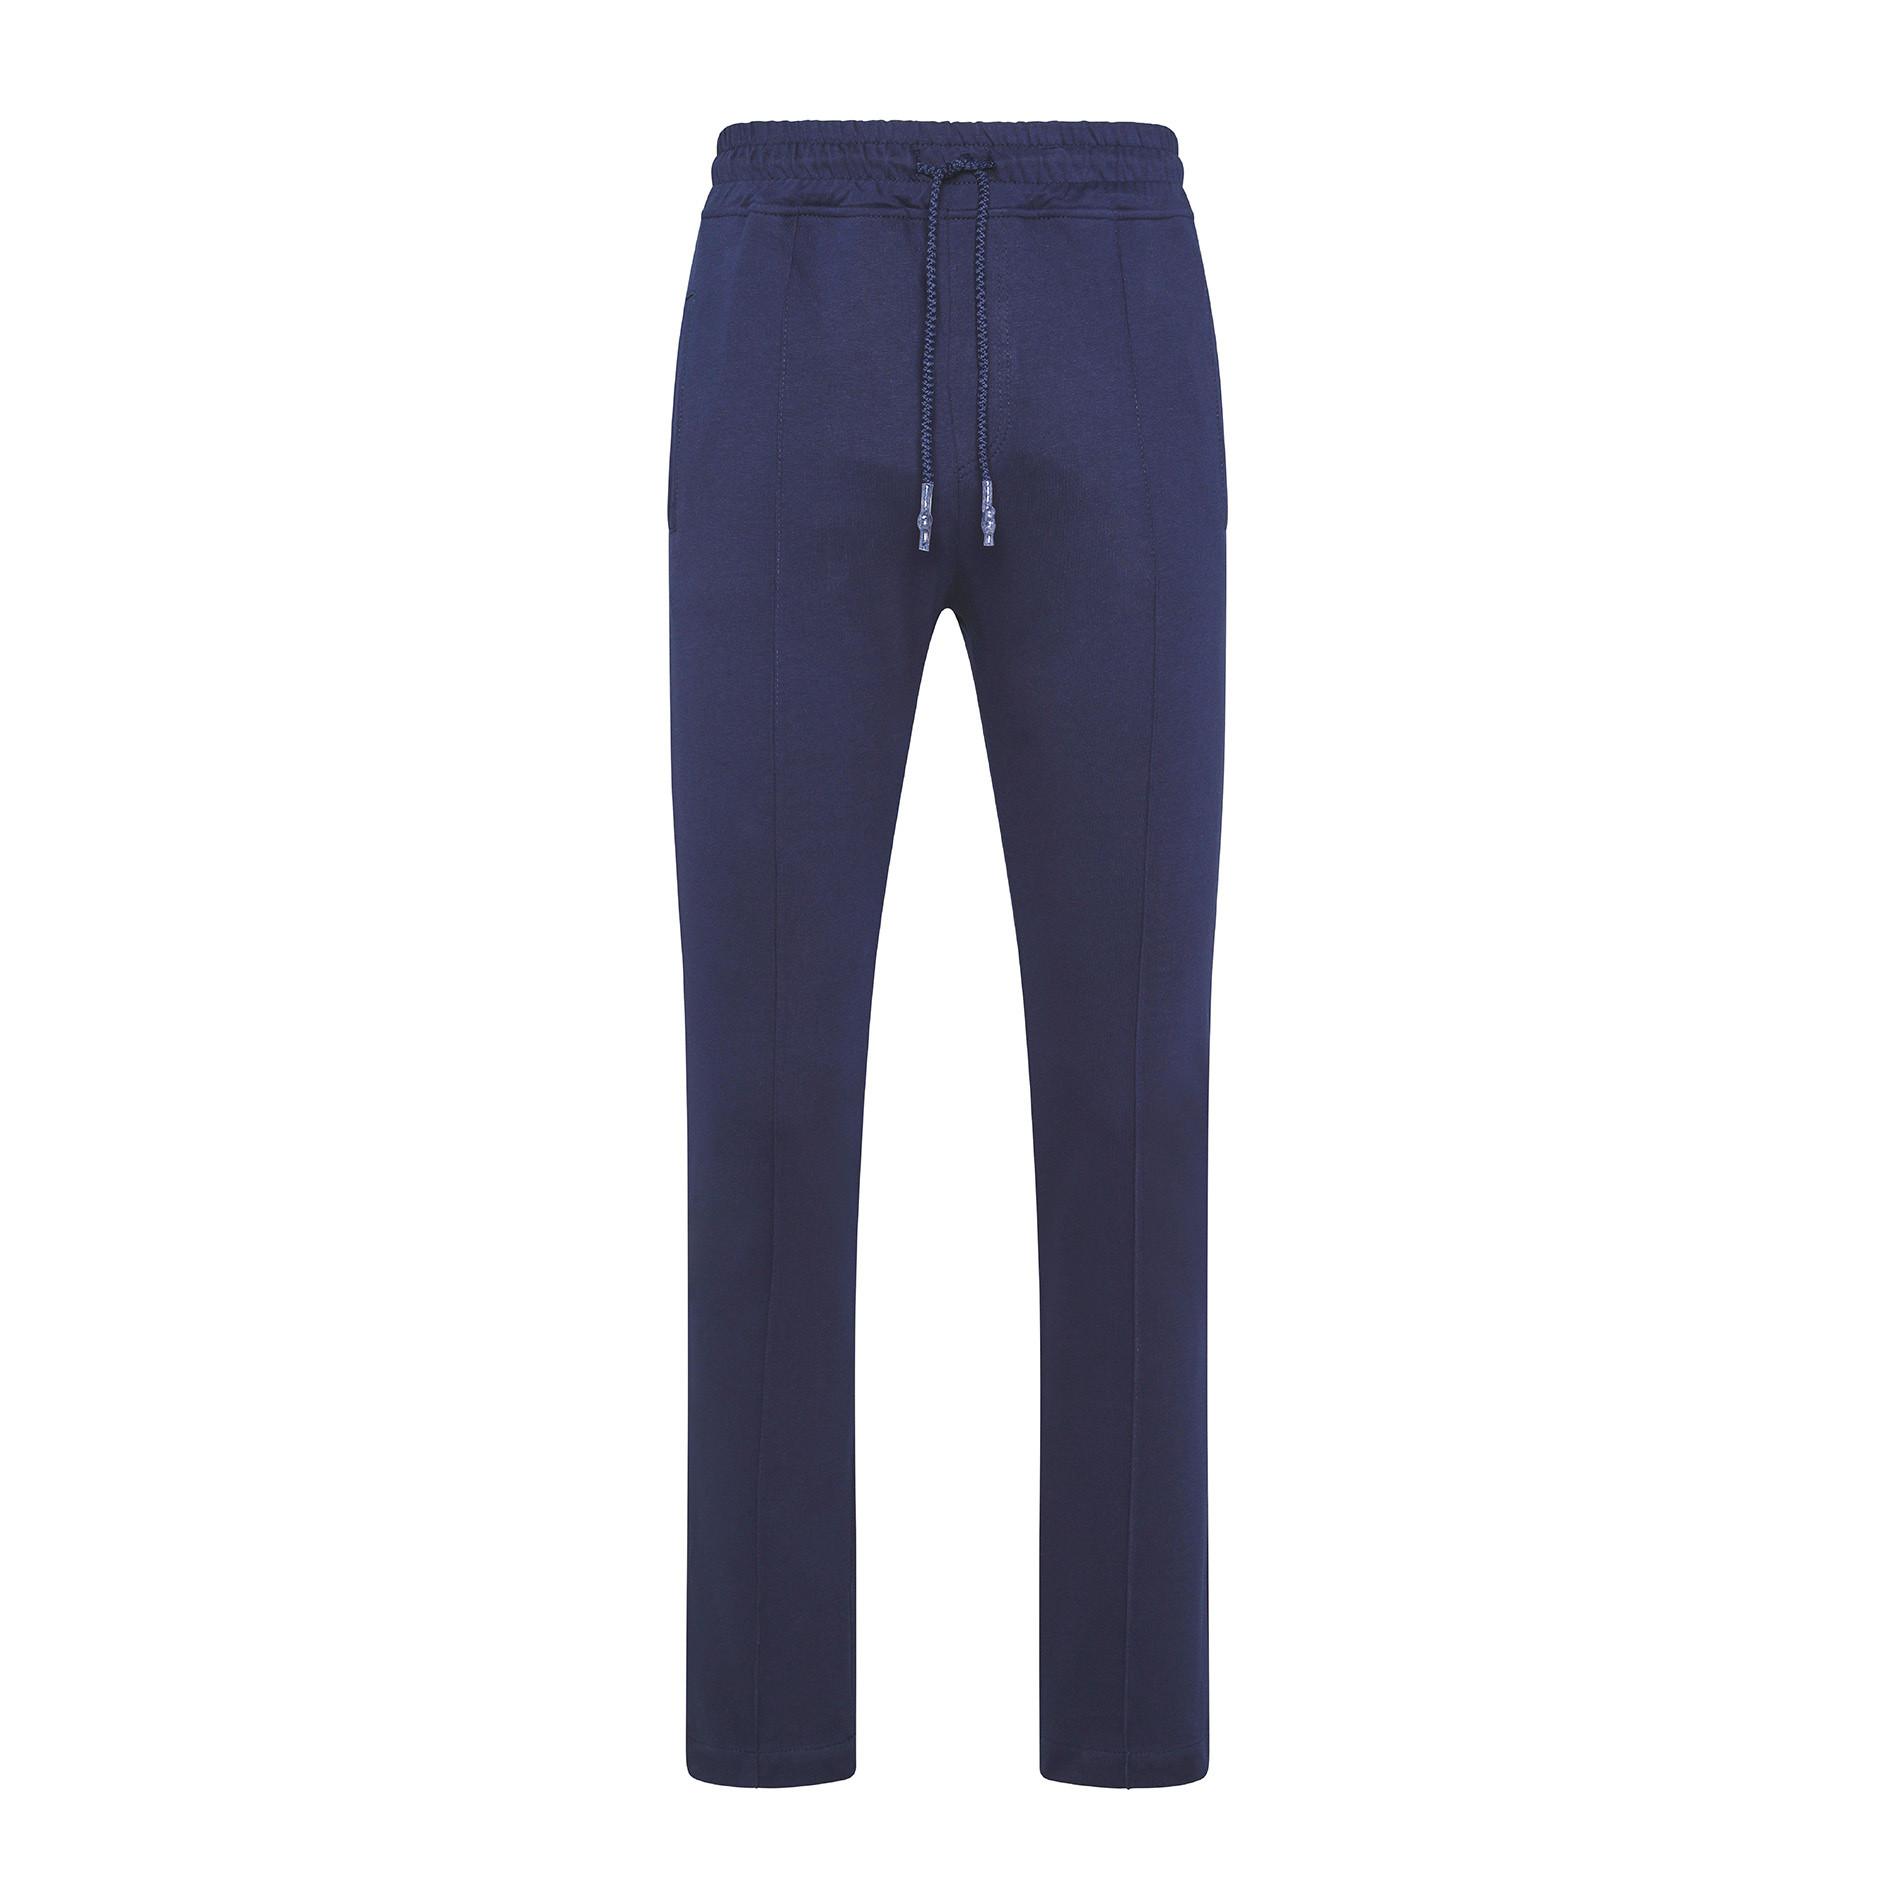 Pantalone felpa di cotone JCT, Blu scuro, large image number 0